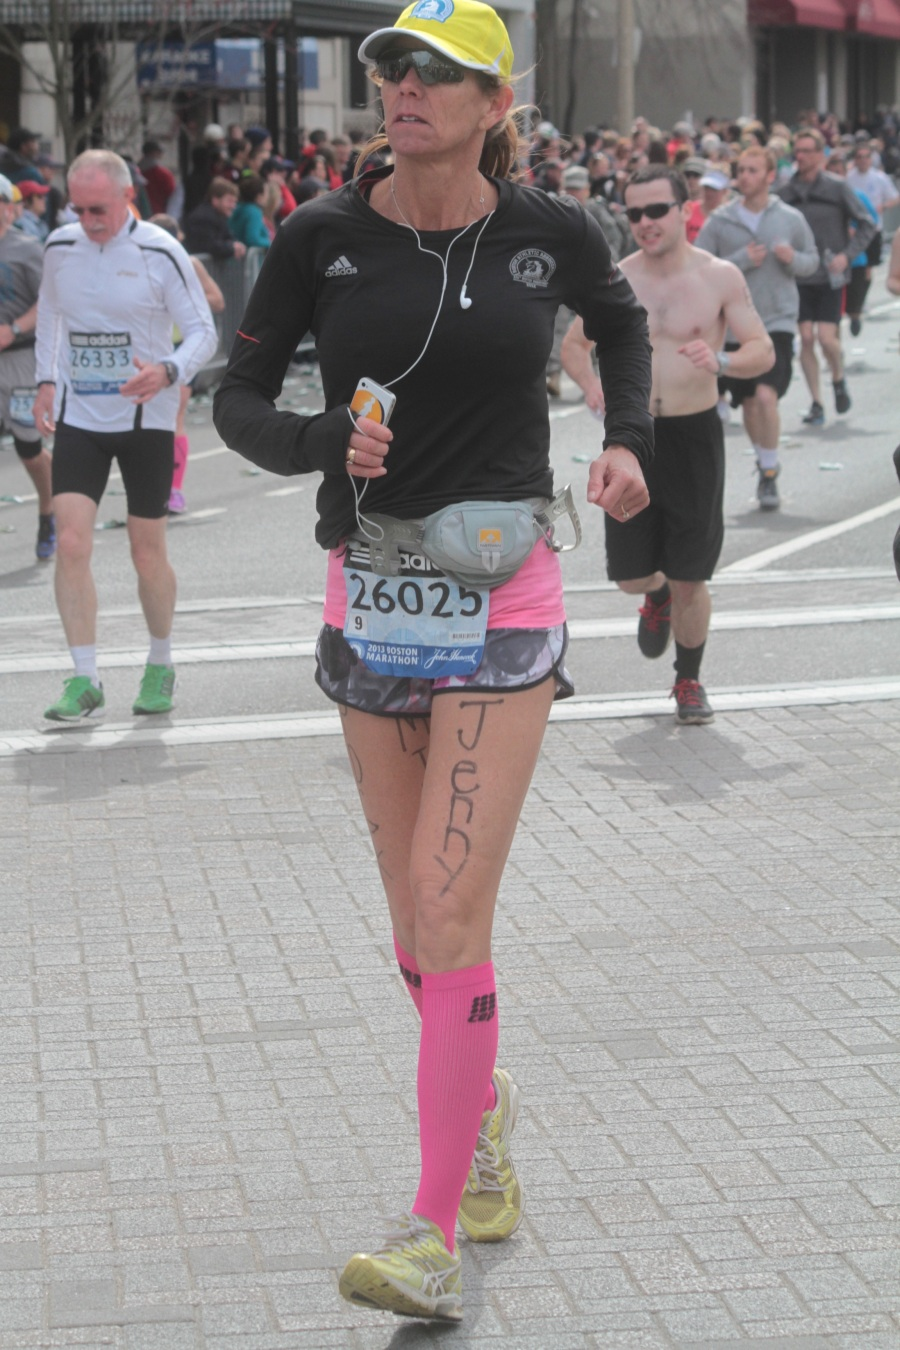 boston marathon 2013 number 26025